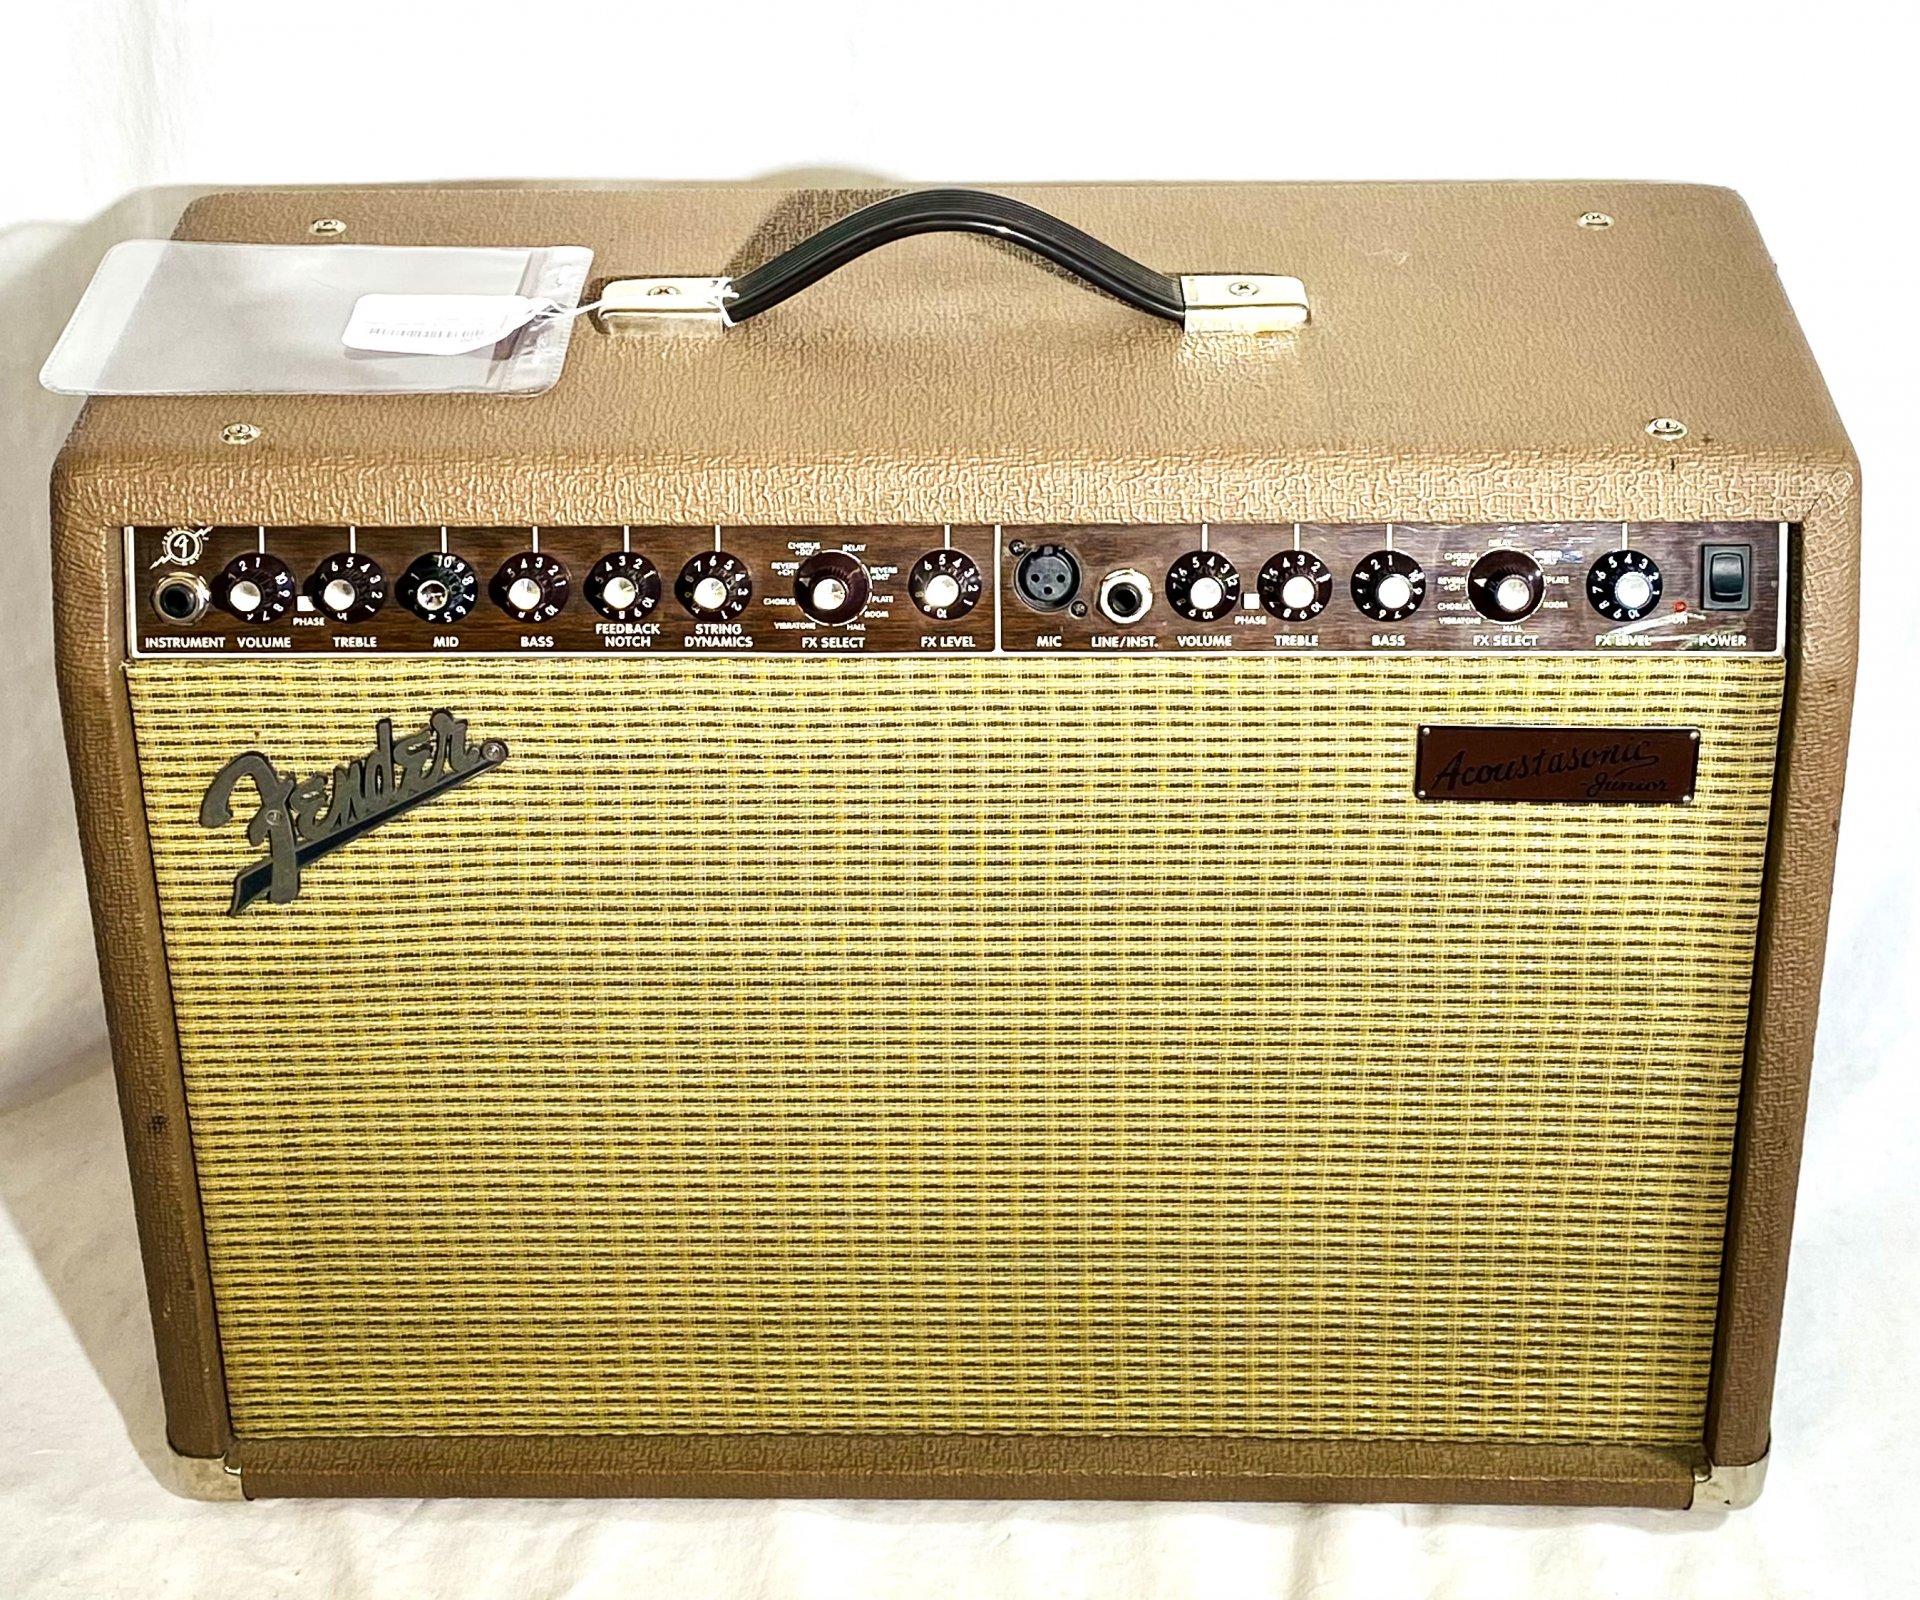 FENDER ACOUSTASONIC JUNIOR COMBO ACOUSTIC/ELECTRIC AMP